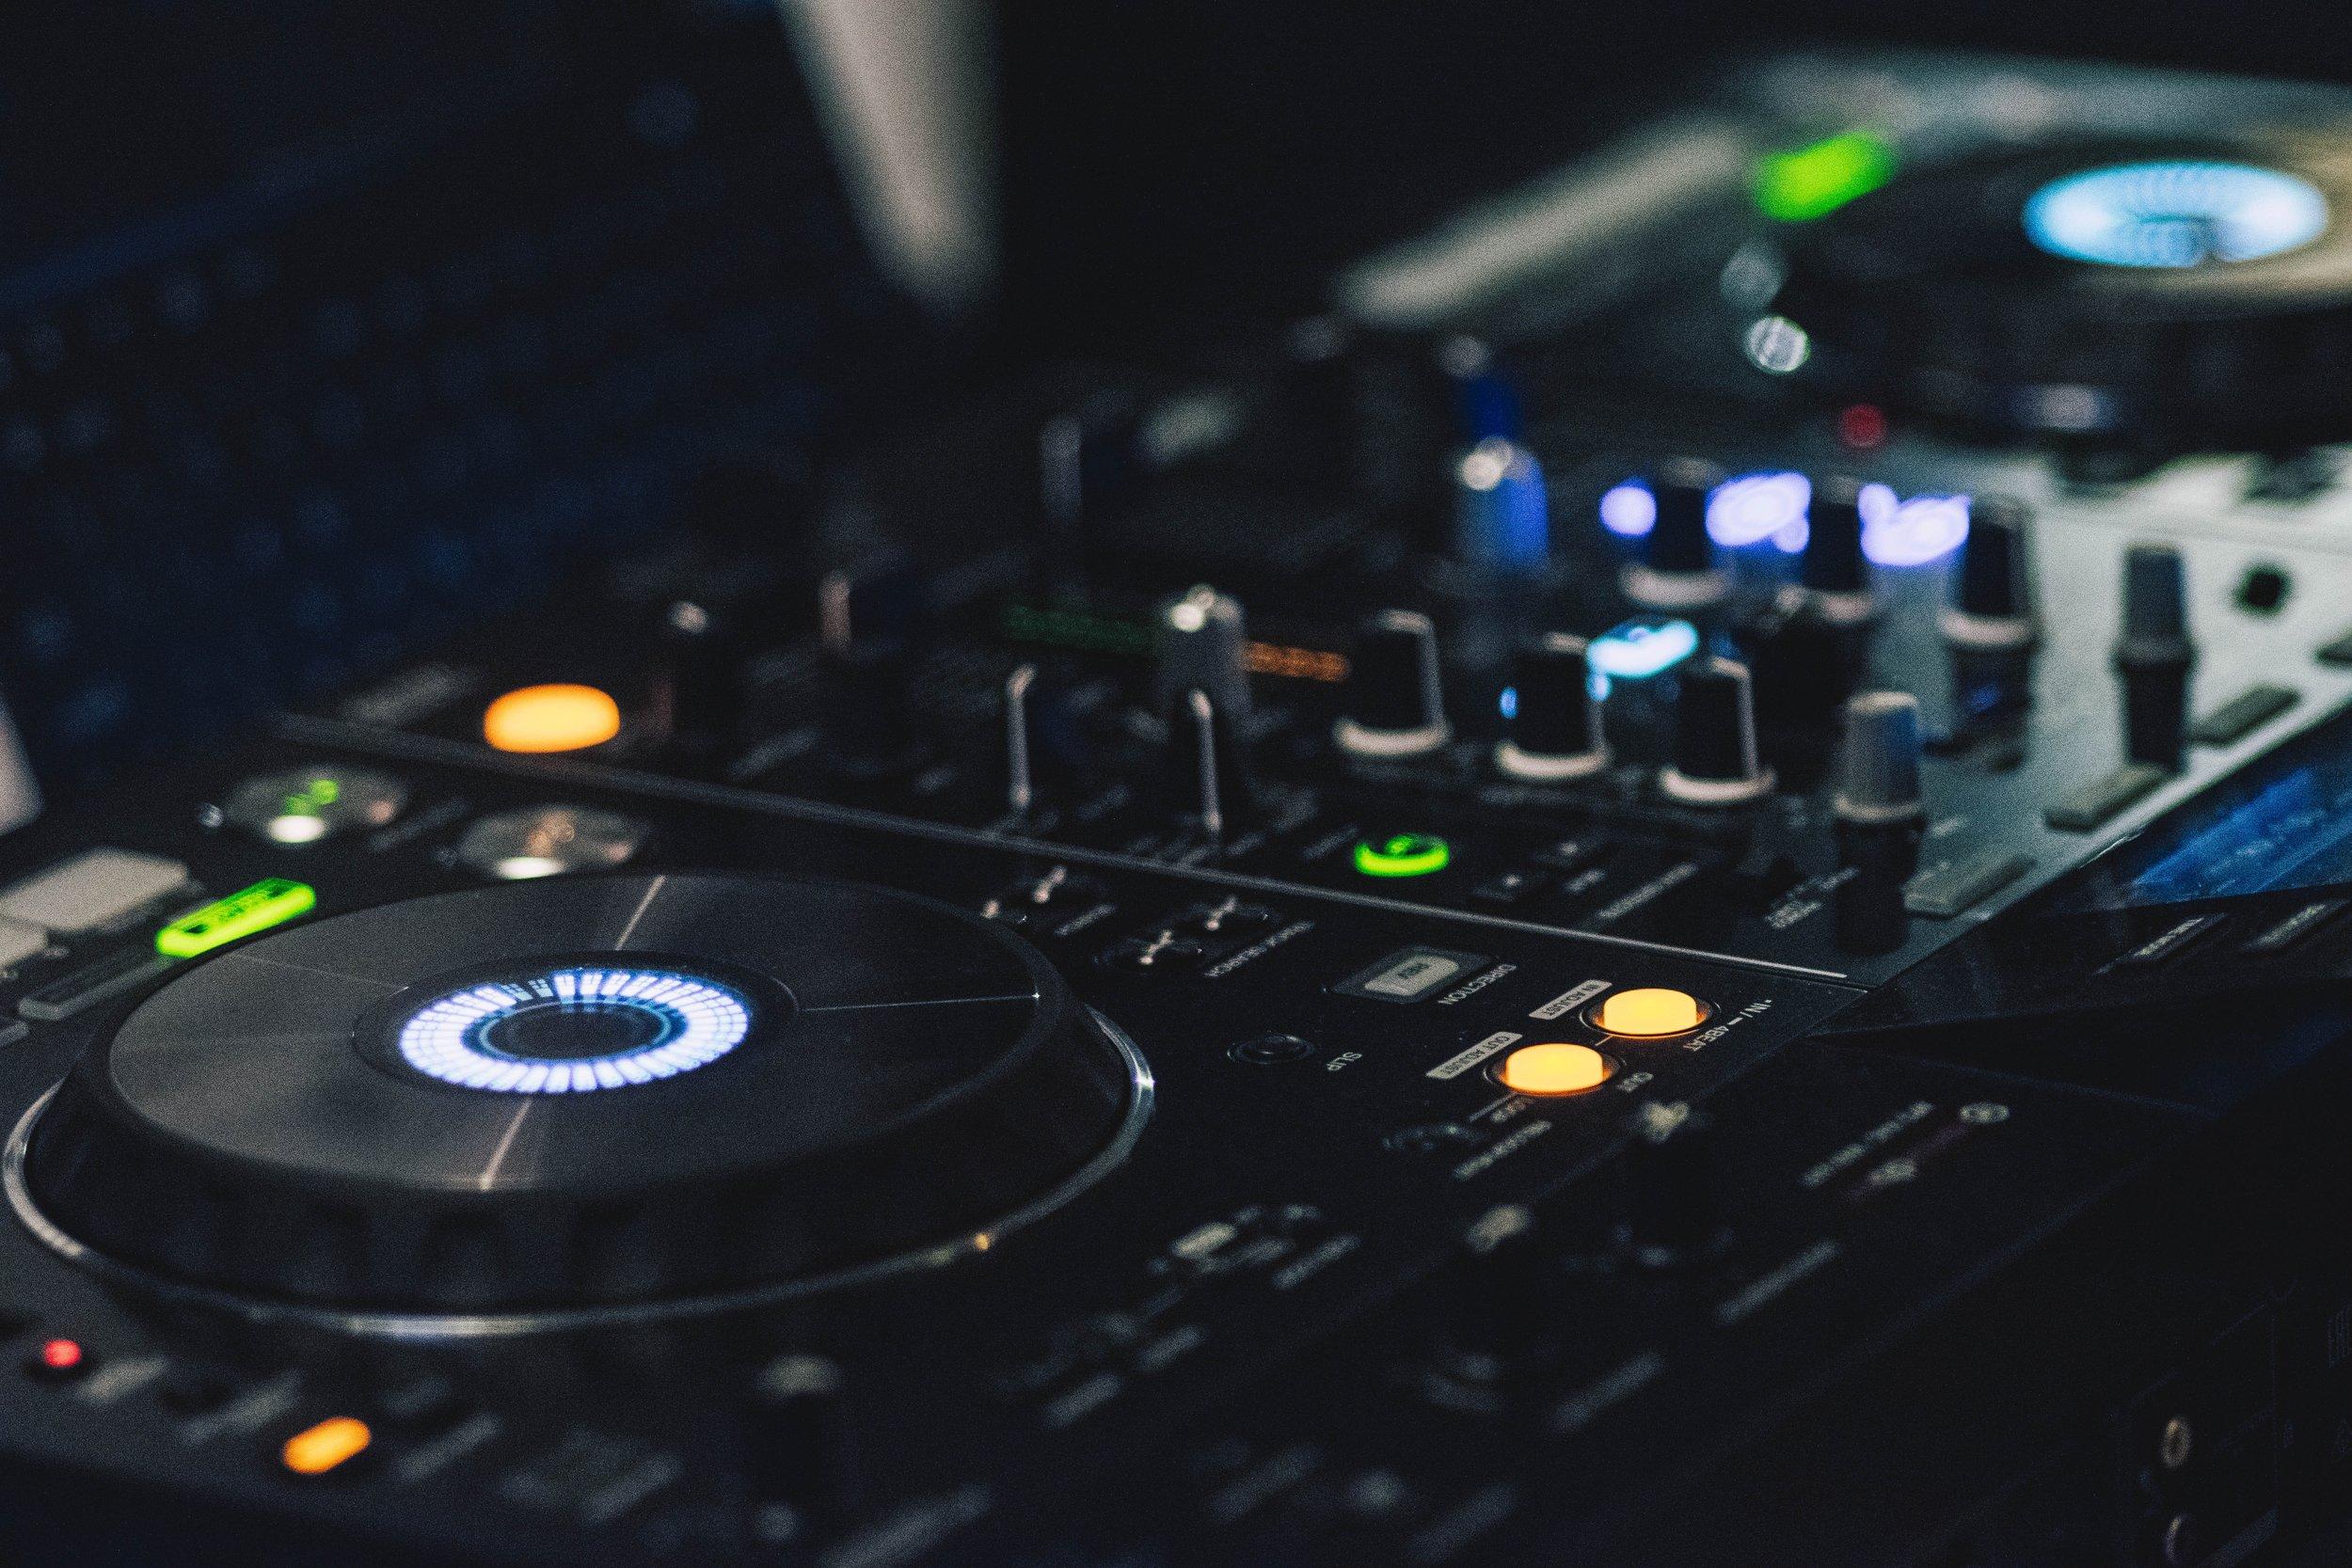 audio-mixer-close-up-console-323687.jpg